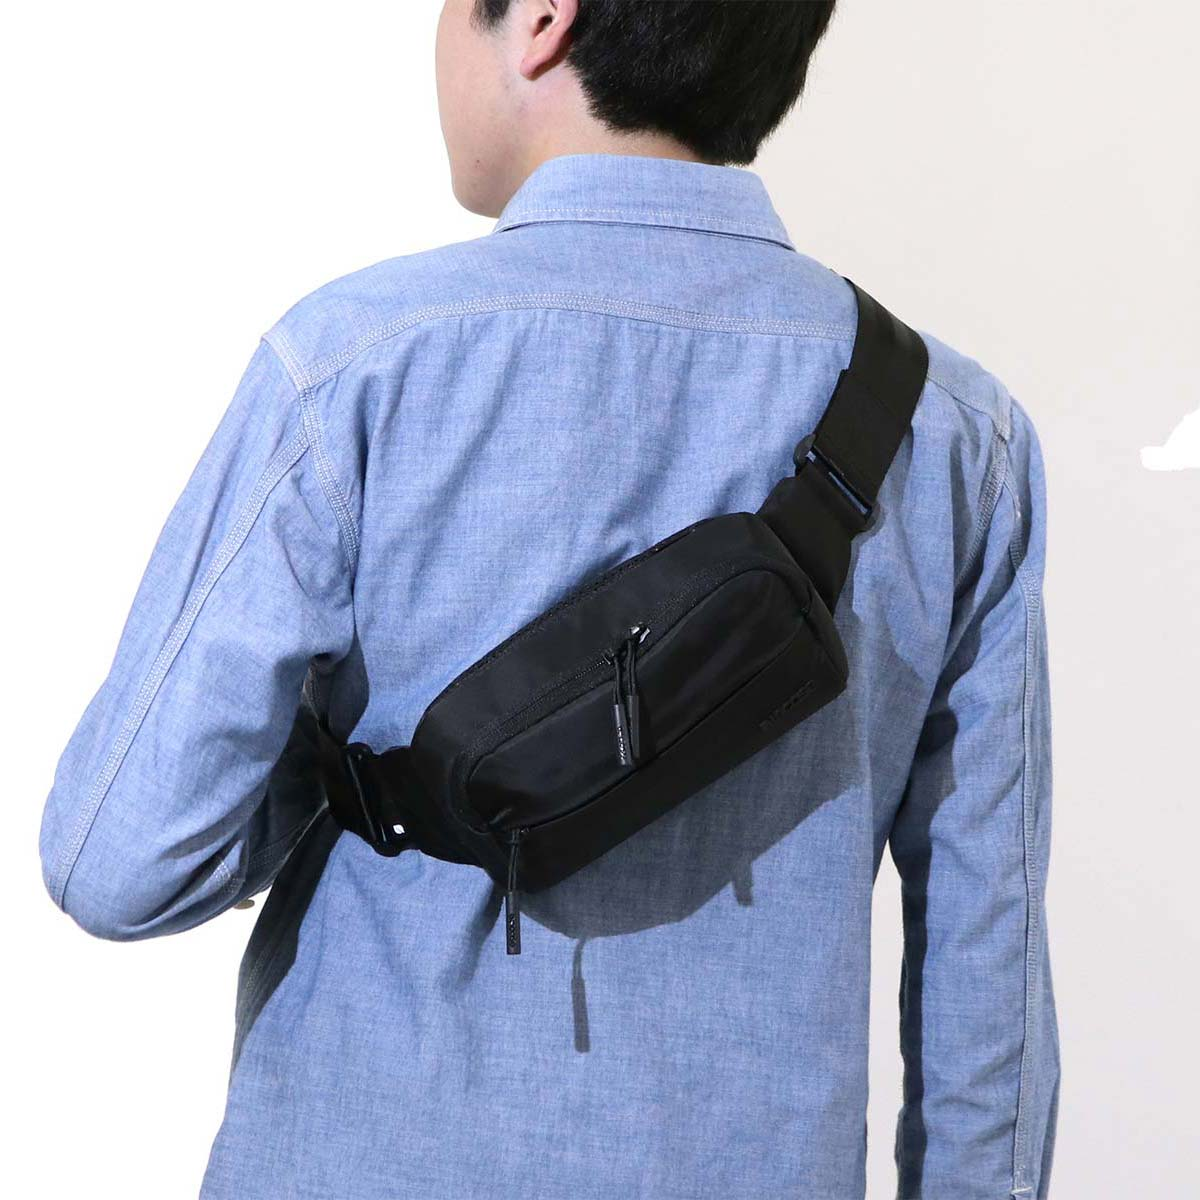 Incase Waist Bag Side